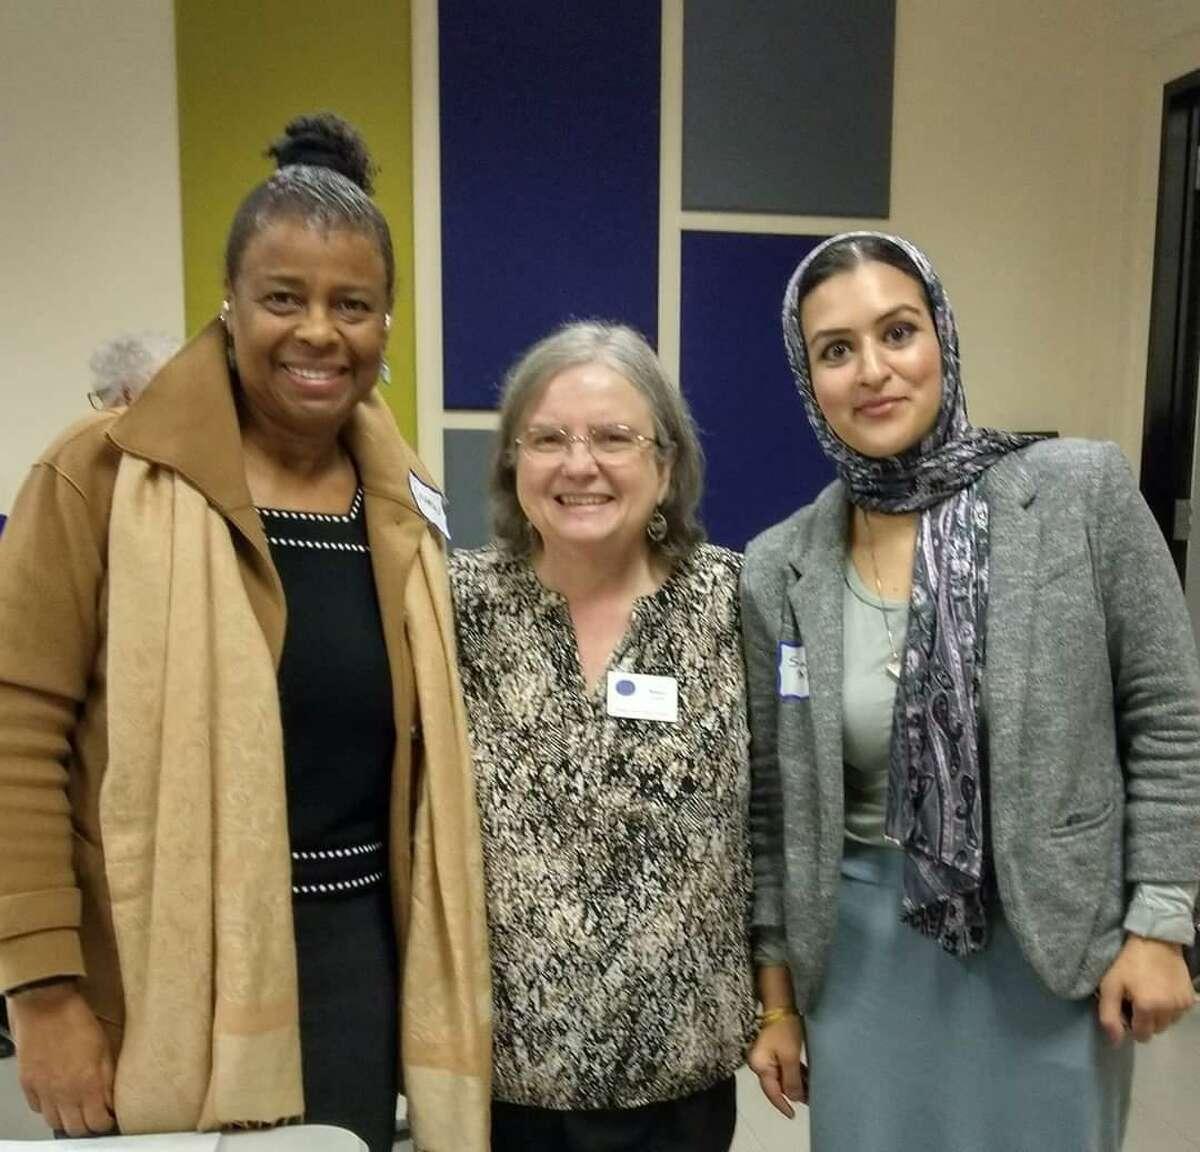 Sharon Davis of the Baha'I faith, Nancy Agafitei of the Lutheran faith, and Sana Mirza, a Sufi Muslim formed their friendship at an interfaith discussion group sponsored by the Spring Interfaith Council.